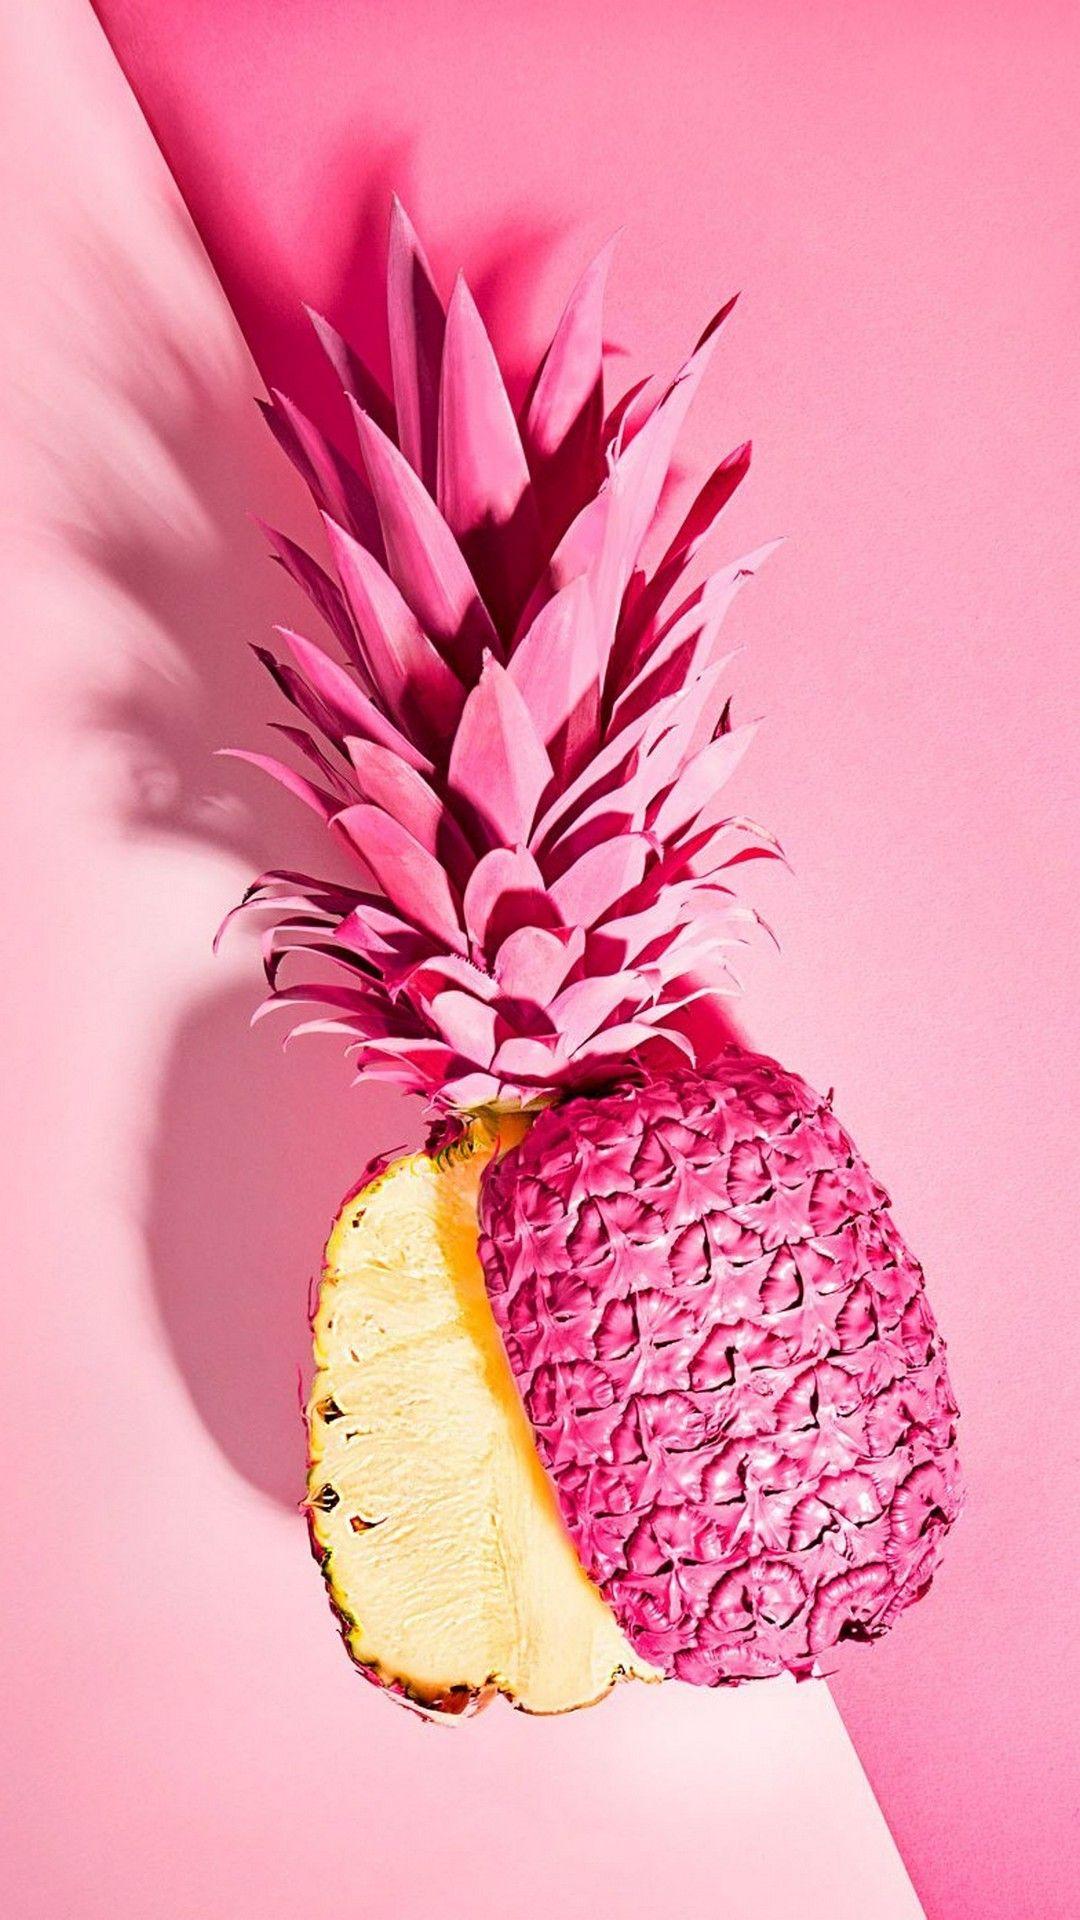 Pink Pineapple Mobile Wallpaper Best Hd Wallpapers Pink Pineapple Wallpaper Pineapple Wallpaper Iphone Wallpaper